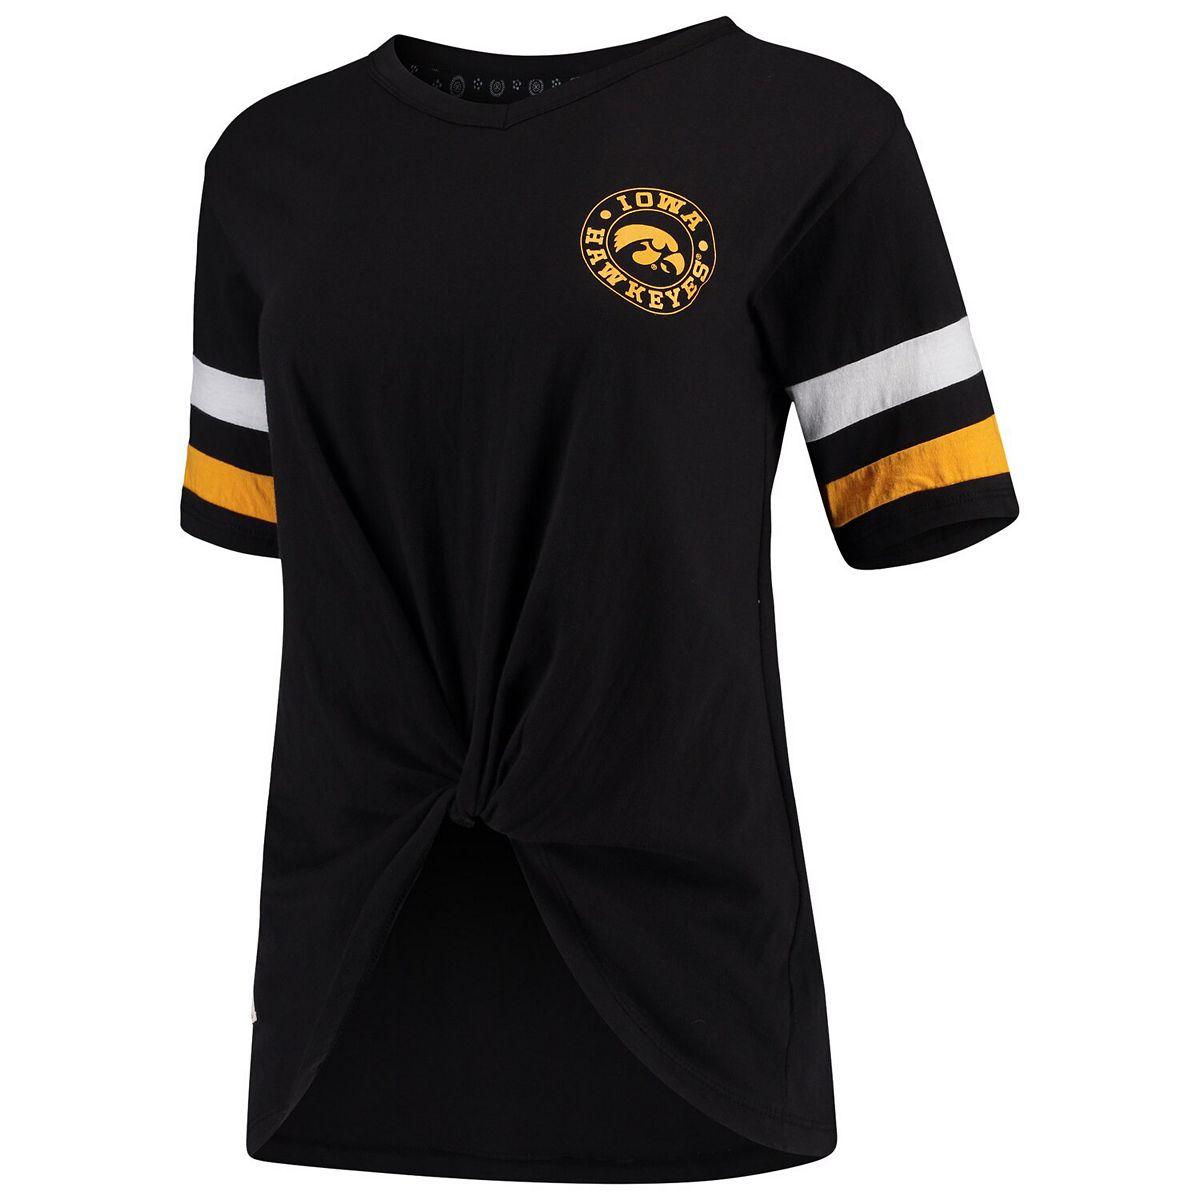 Women's Pressbox Black Iowa Hawkeyes Knotted Hem V-Neck T-Shirt WL2qk